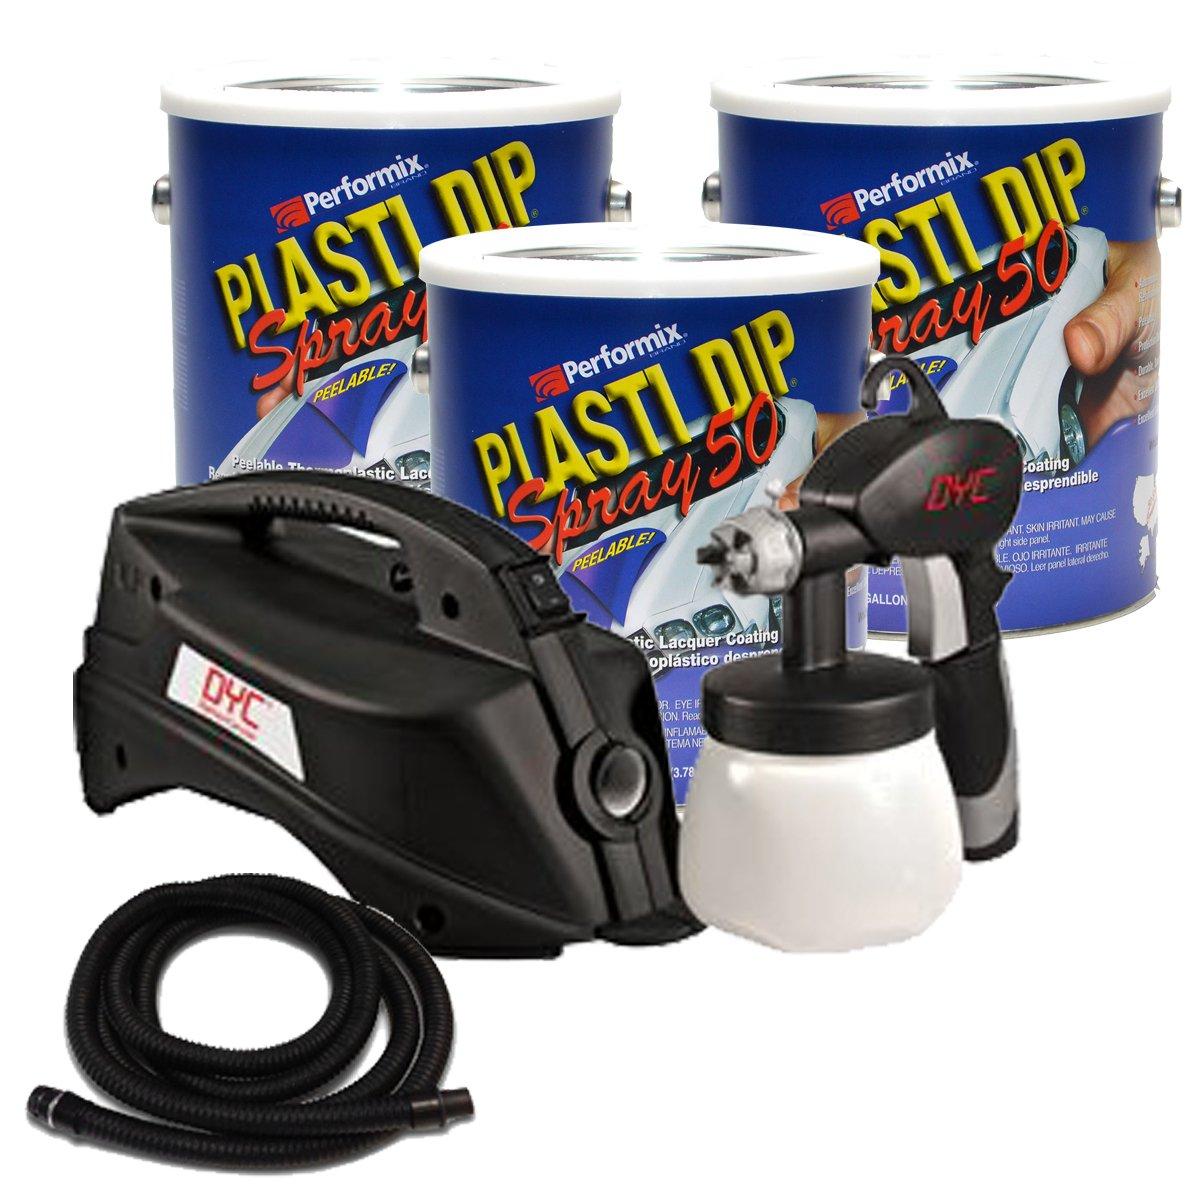 Bundle - 4 Pieces - Plasti Dip Low VOC 3 Gallon Basic Car Kit - Black (California Legal)